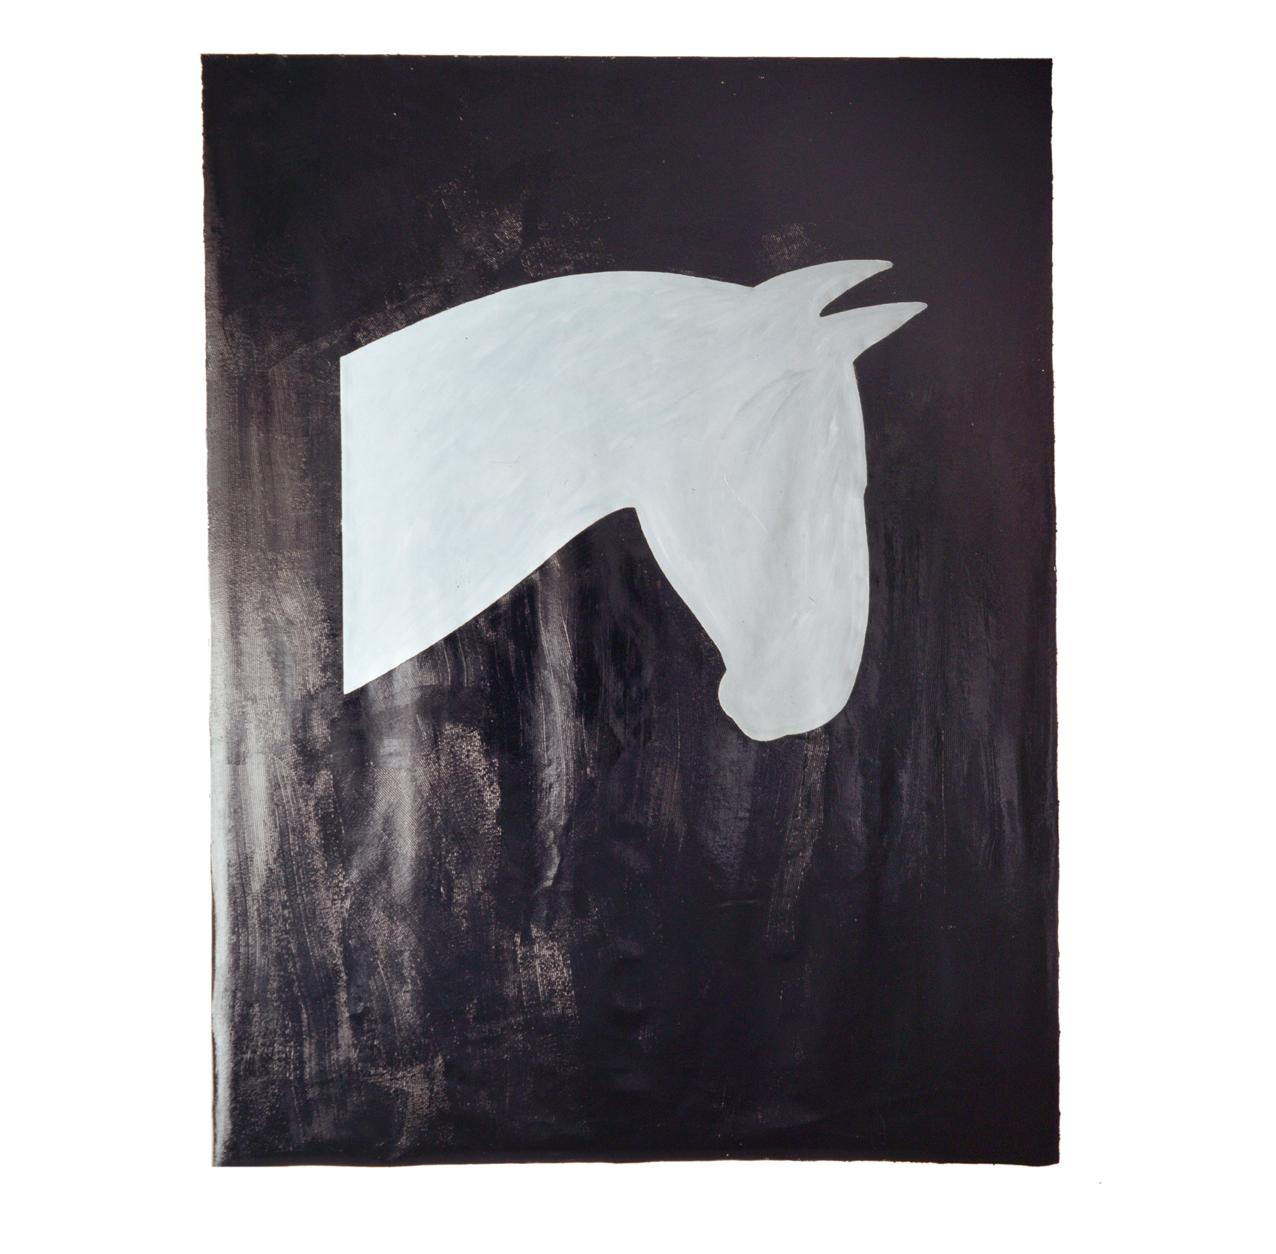 """Pferdebild hellgrau"" 1981, Teer, Öl auf Leinwand, 275 x 210 cm - Sammlung Kaiser Wilhelm Museum Krefeld - Foto Stephan Hadler"